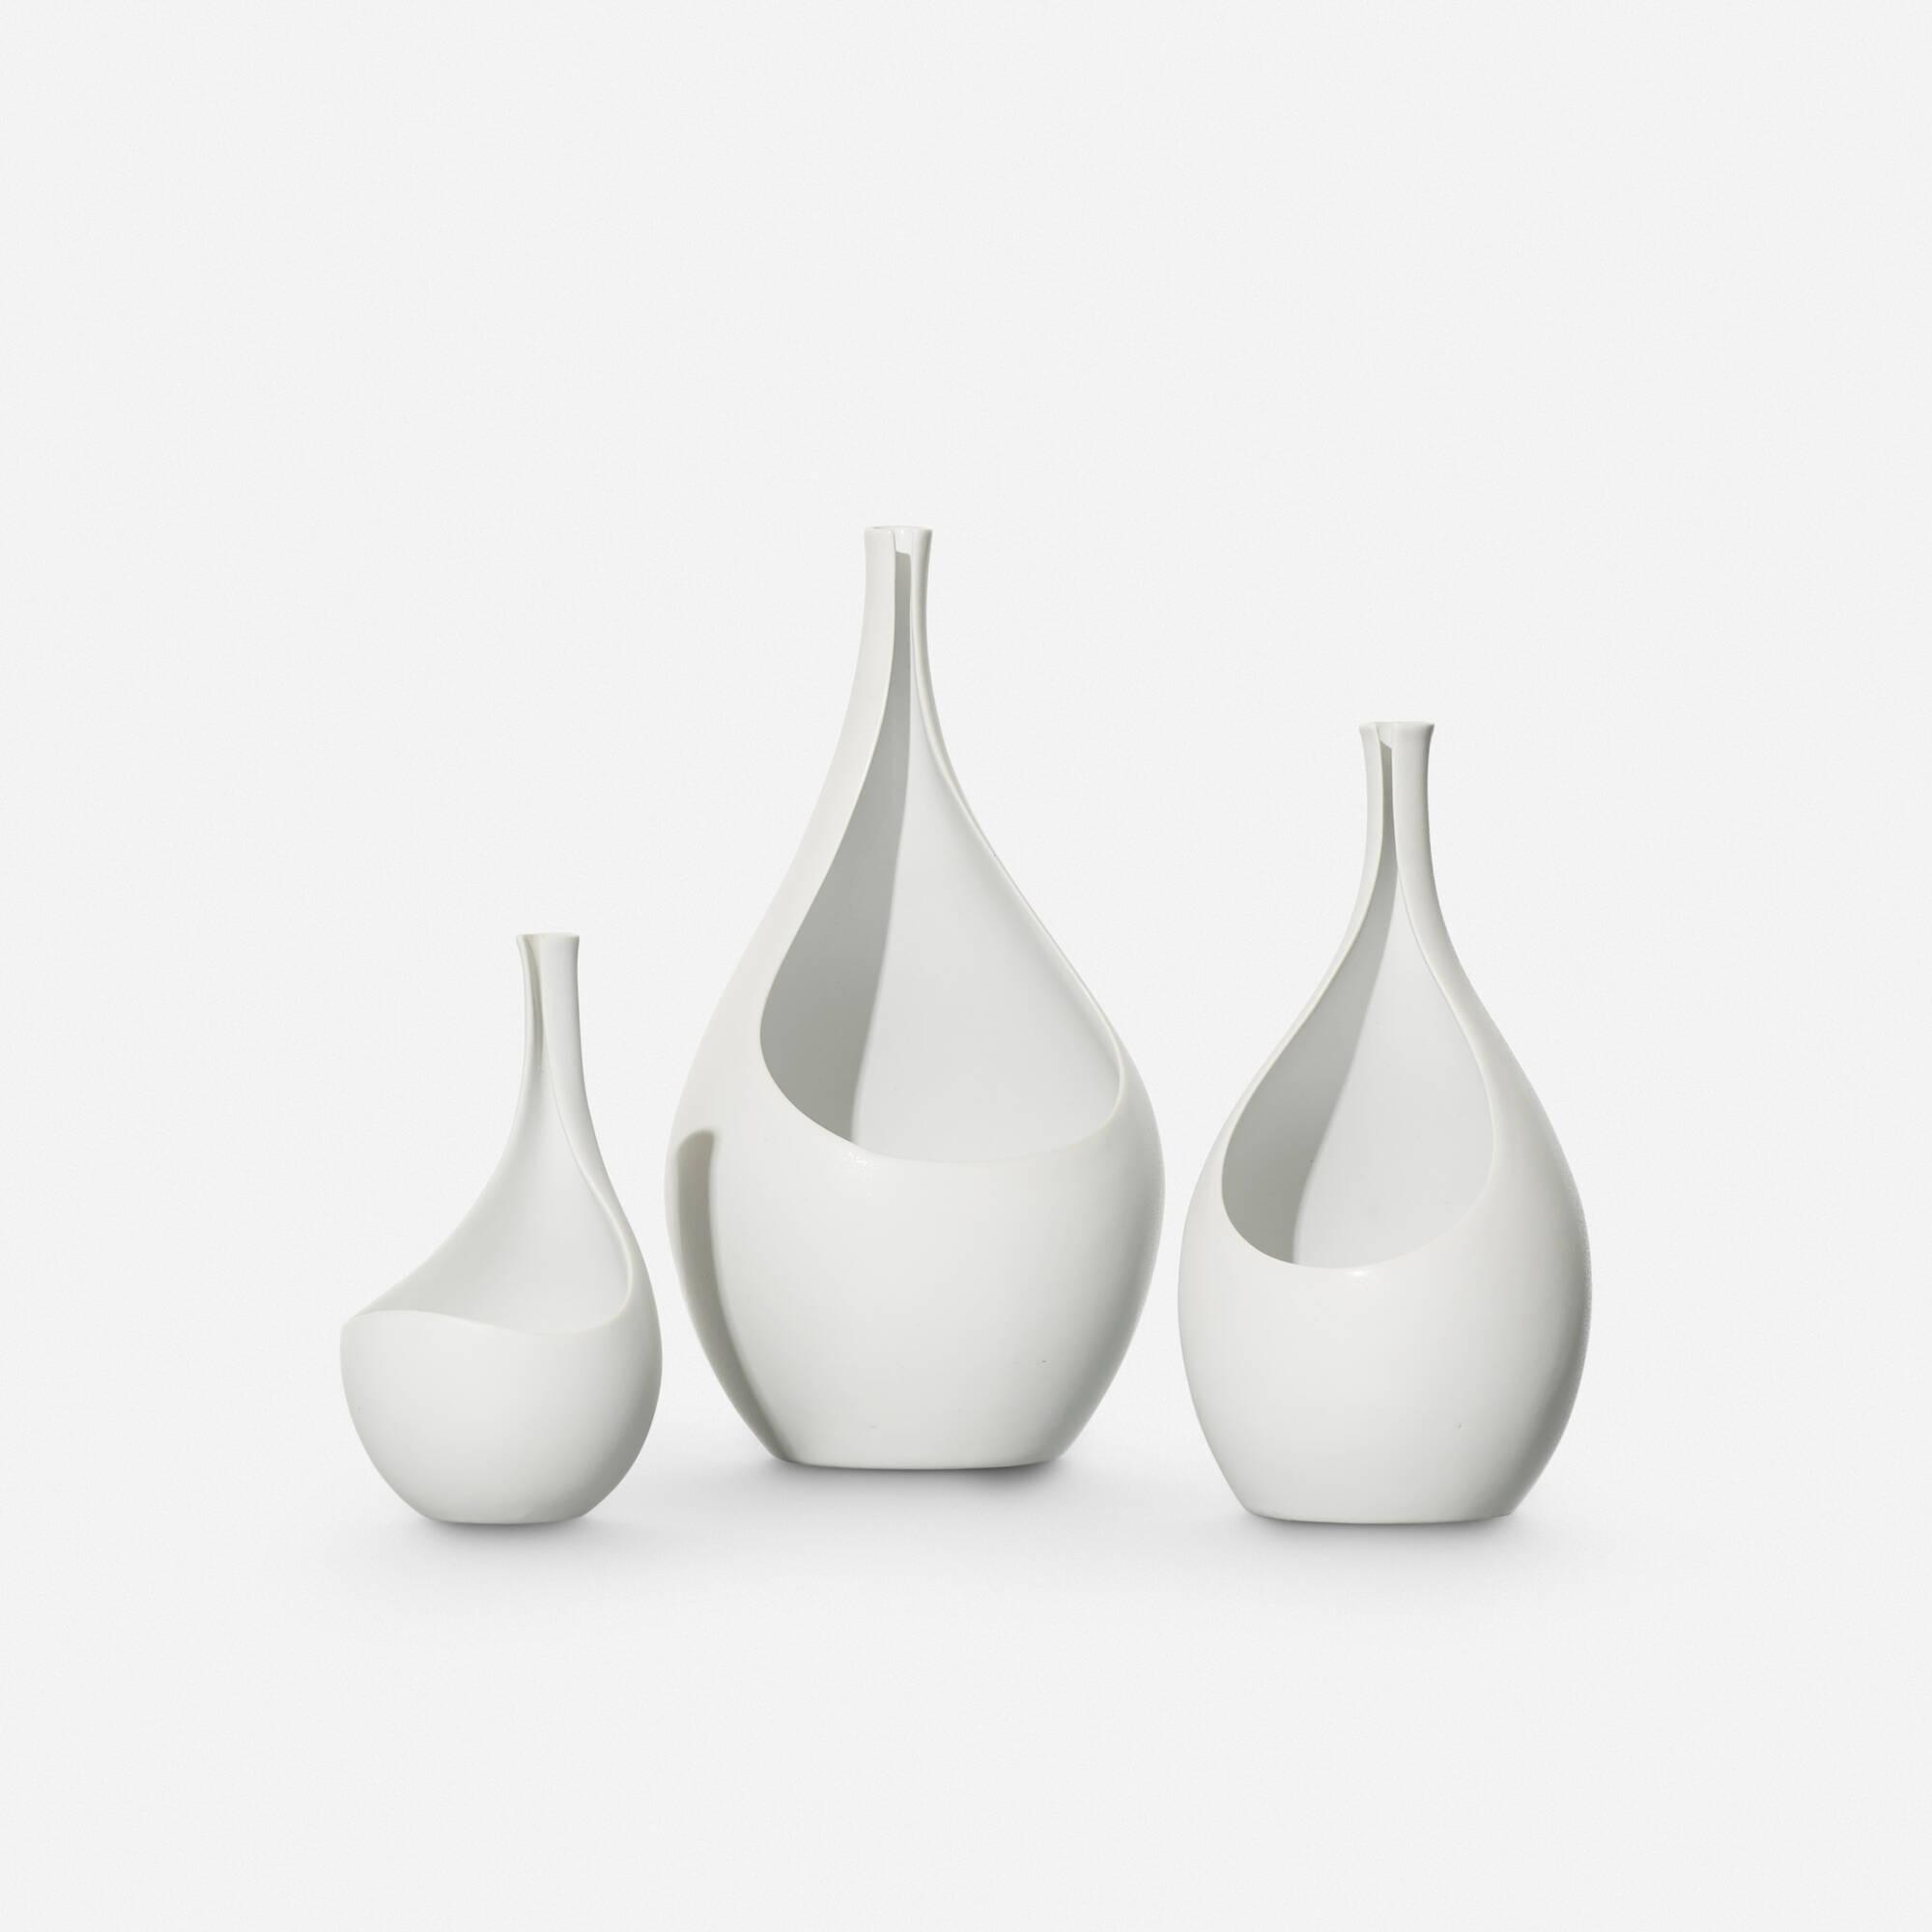 512: Stig Lindberg / collection of three Pungo vases (1 of 1)